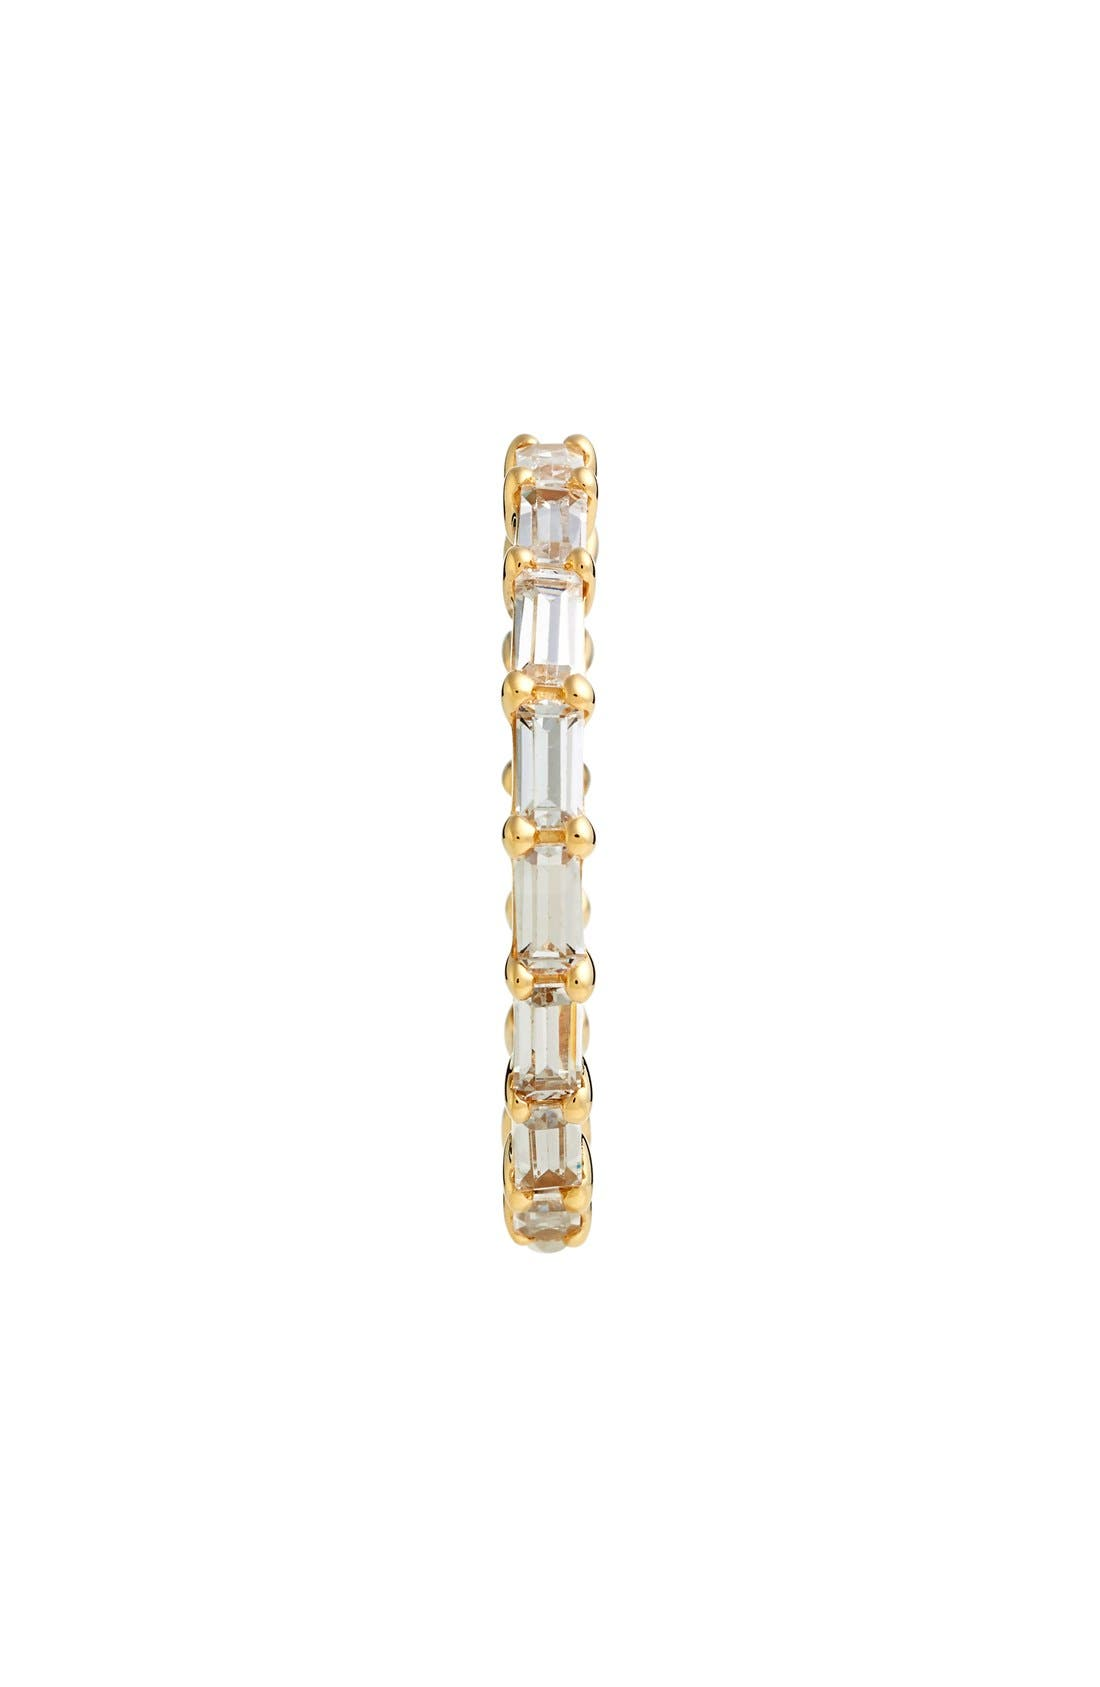 Stackable Cubic Zirconia Baguette Ring,                             Alternate thumbnail 2, color,                             GOLD